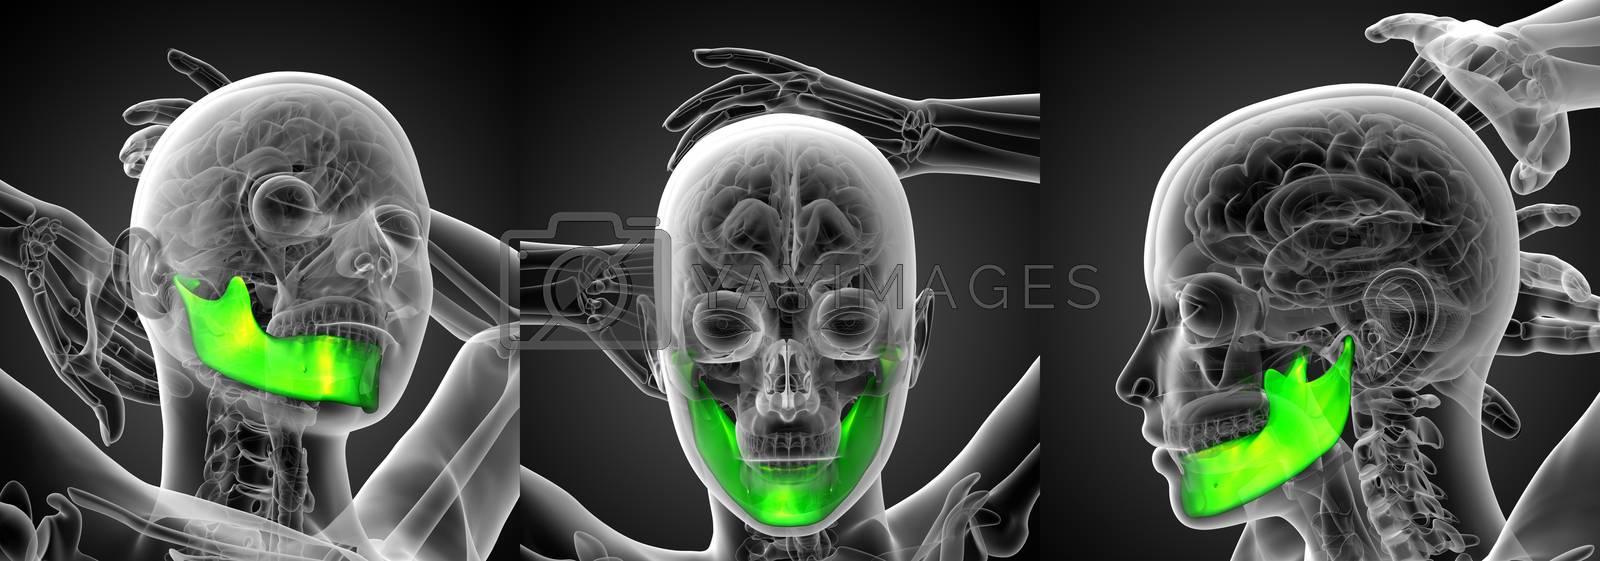 3d rendering illustration of a jaw bone